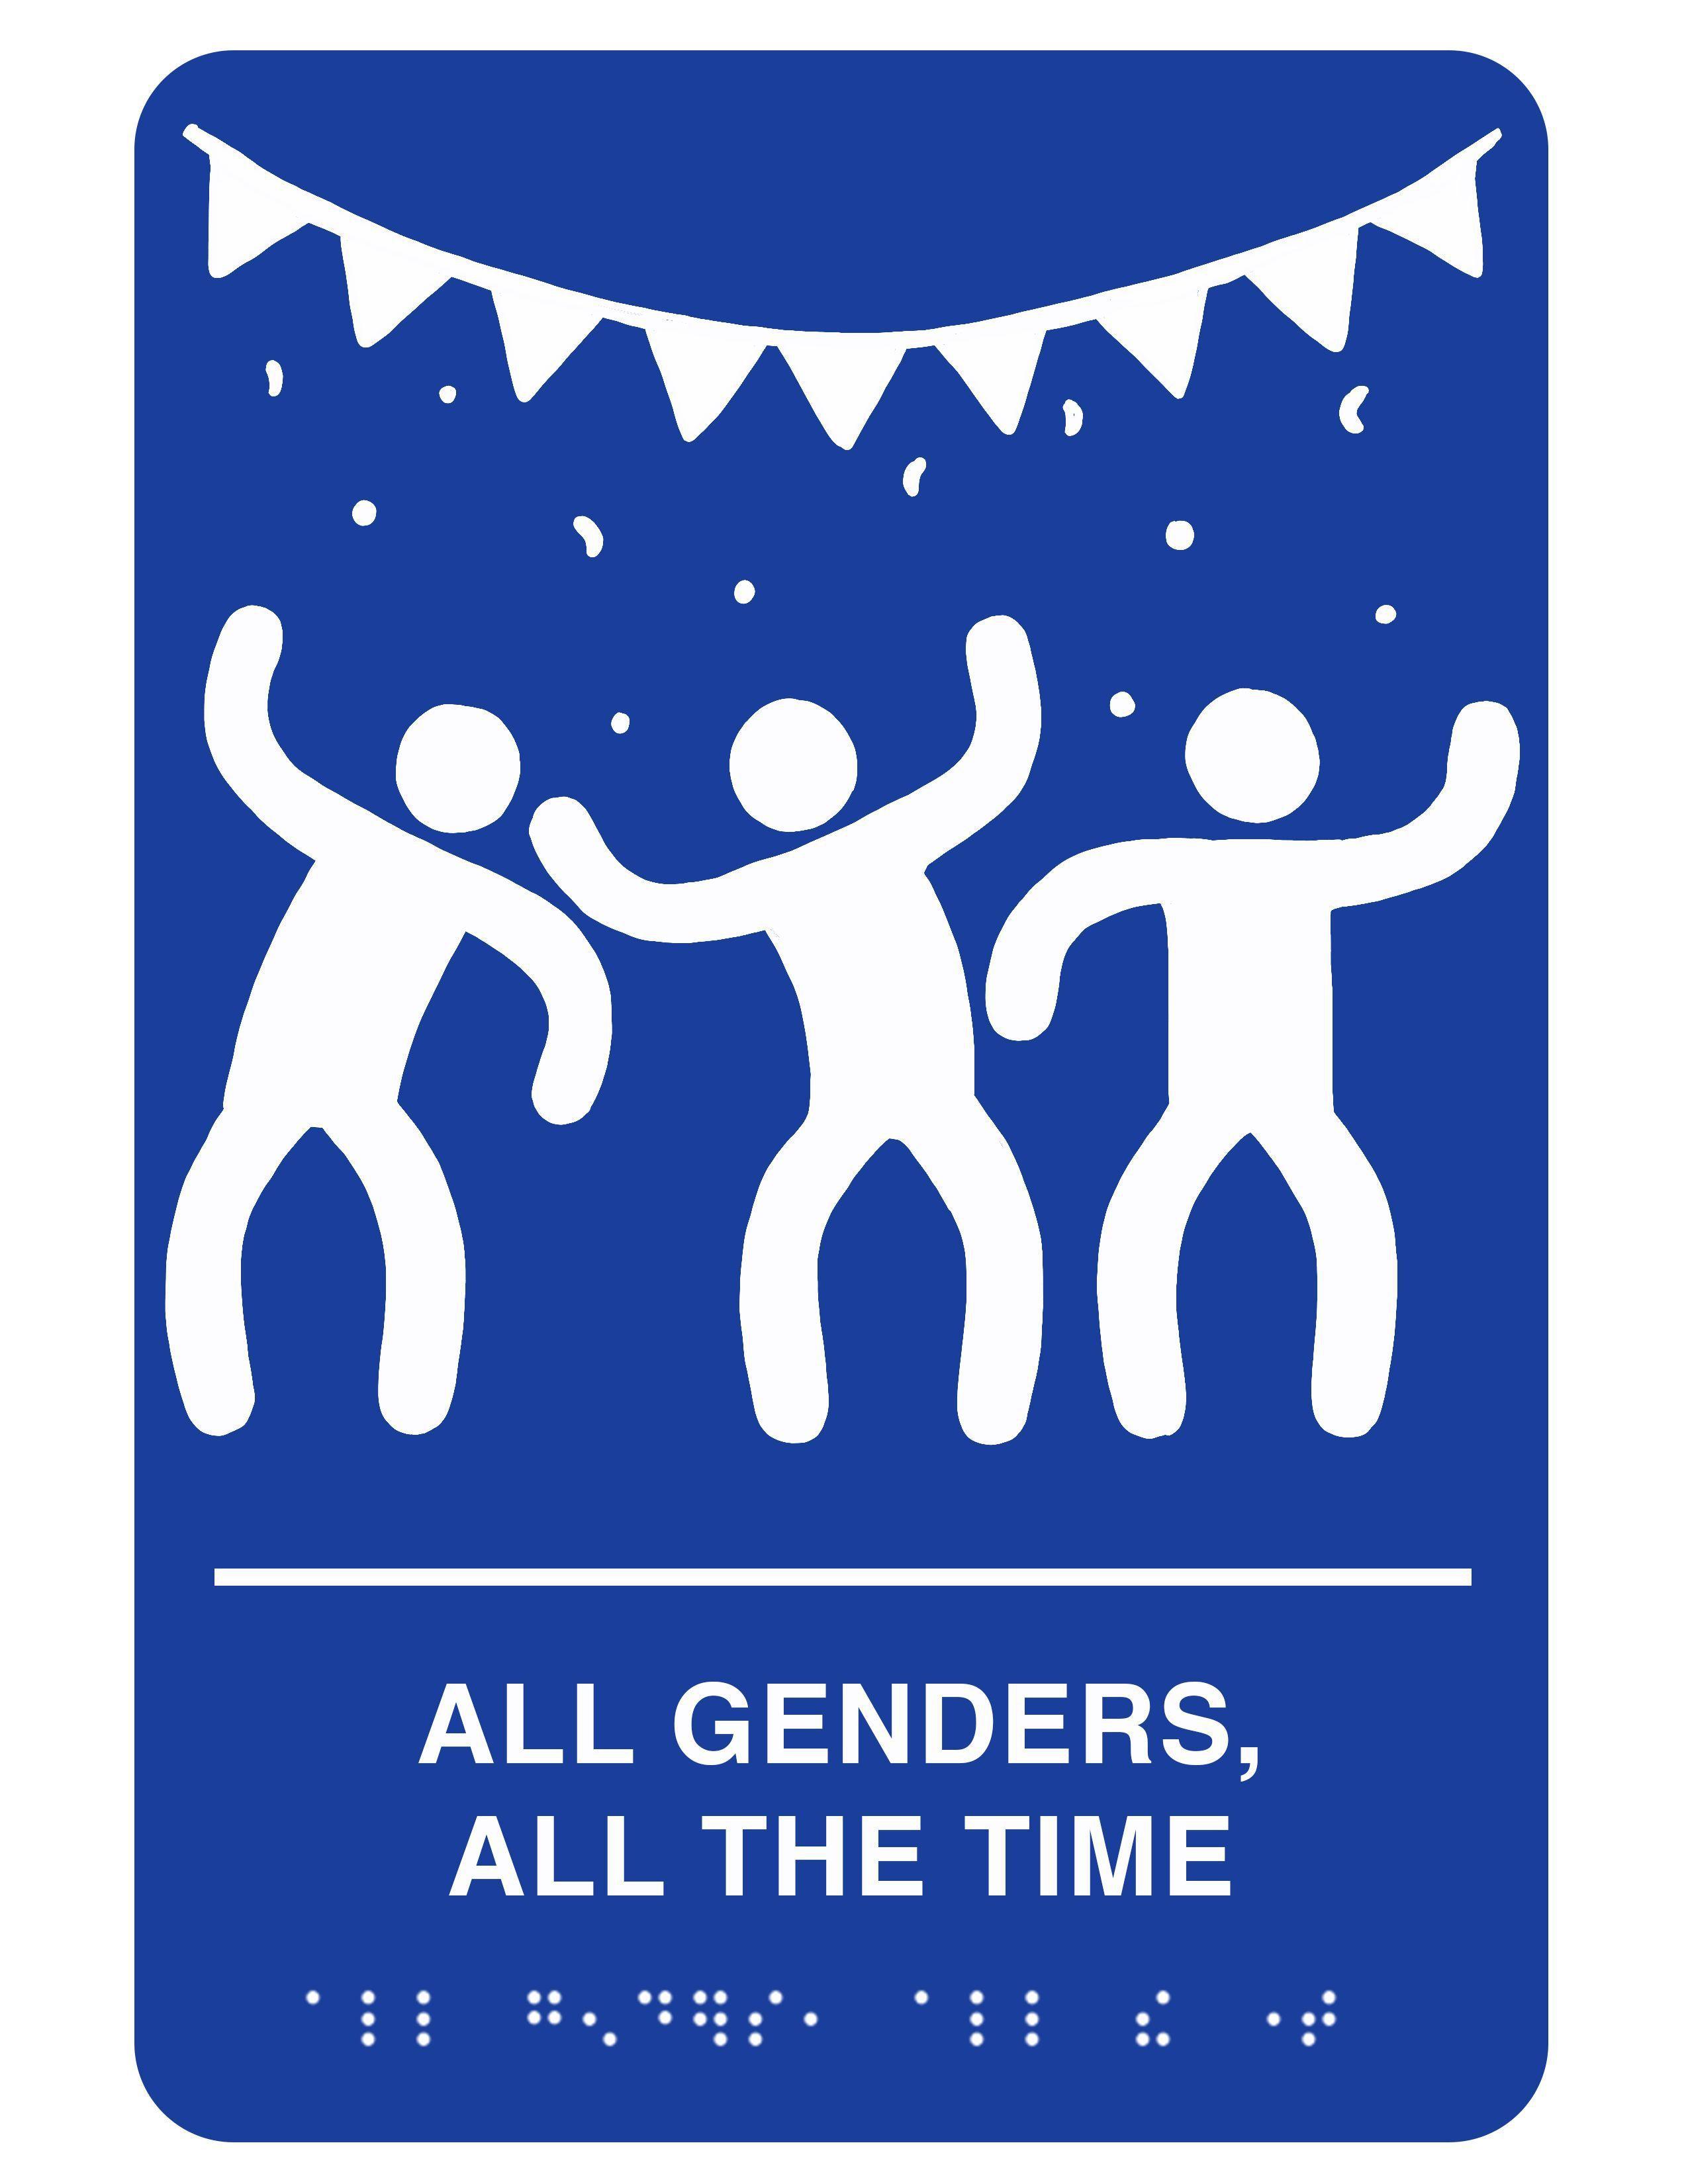 Call It Guerrilla Gender Inclusive Bathroom Art Gender Neutral Bathroom Signs Unisex Bathroom Sign Neutral Bathroom